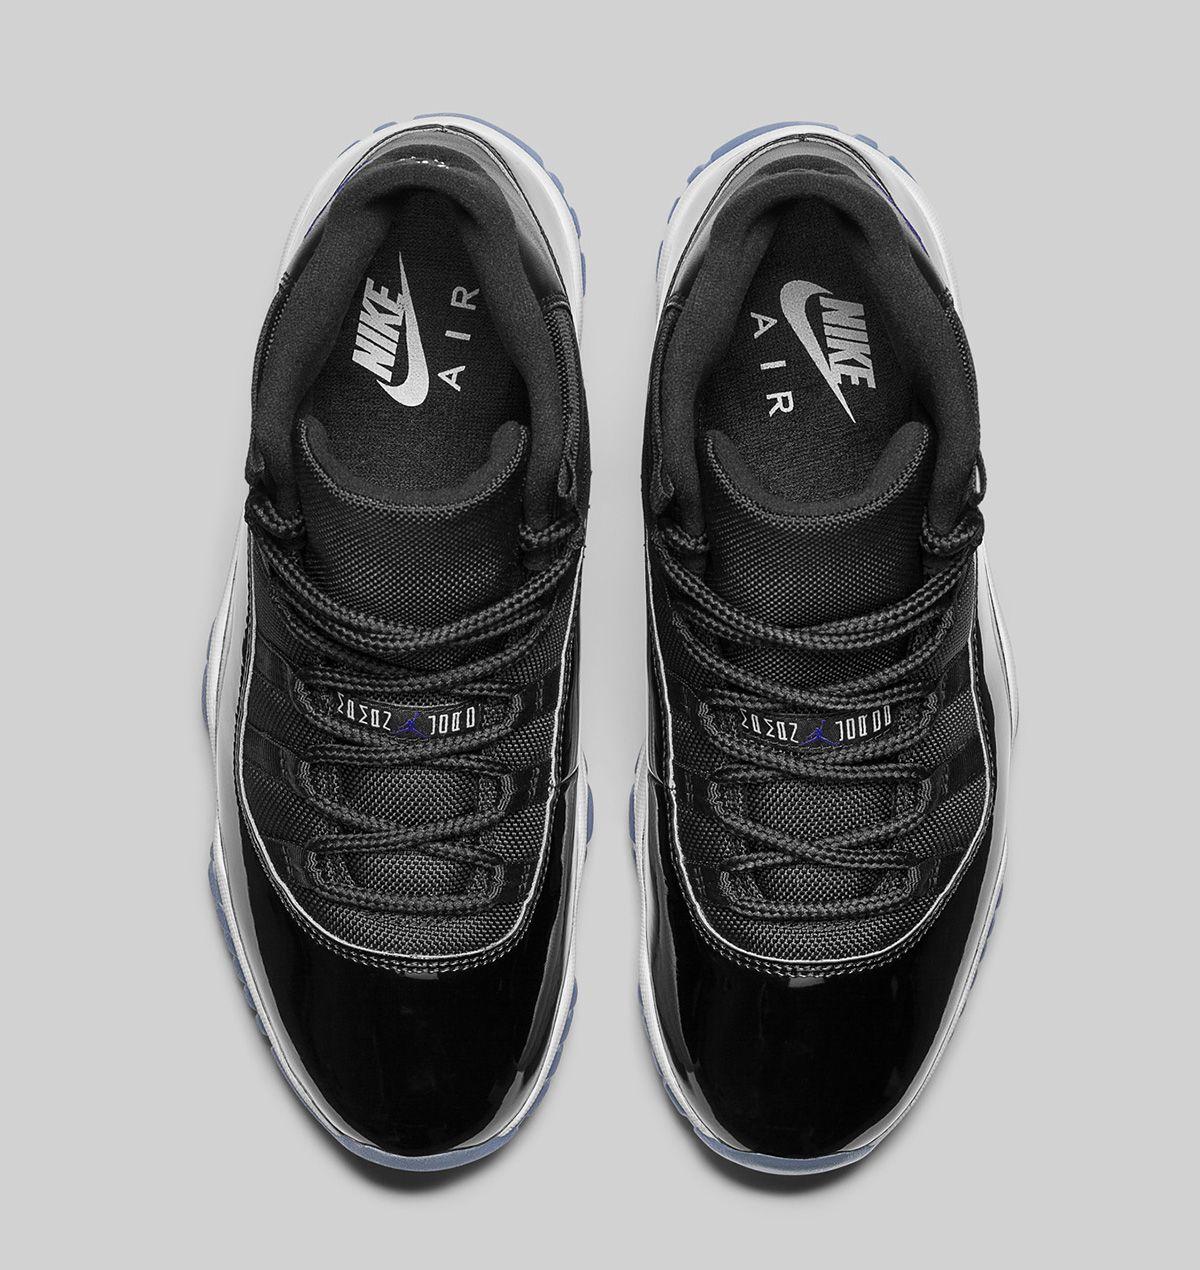 eb2d028d2909 Jordan Brand Unveils the Space Jam Collection - EU Kicks  Sneaker Magazine